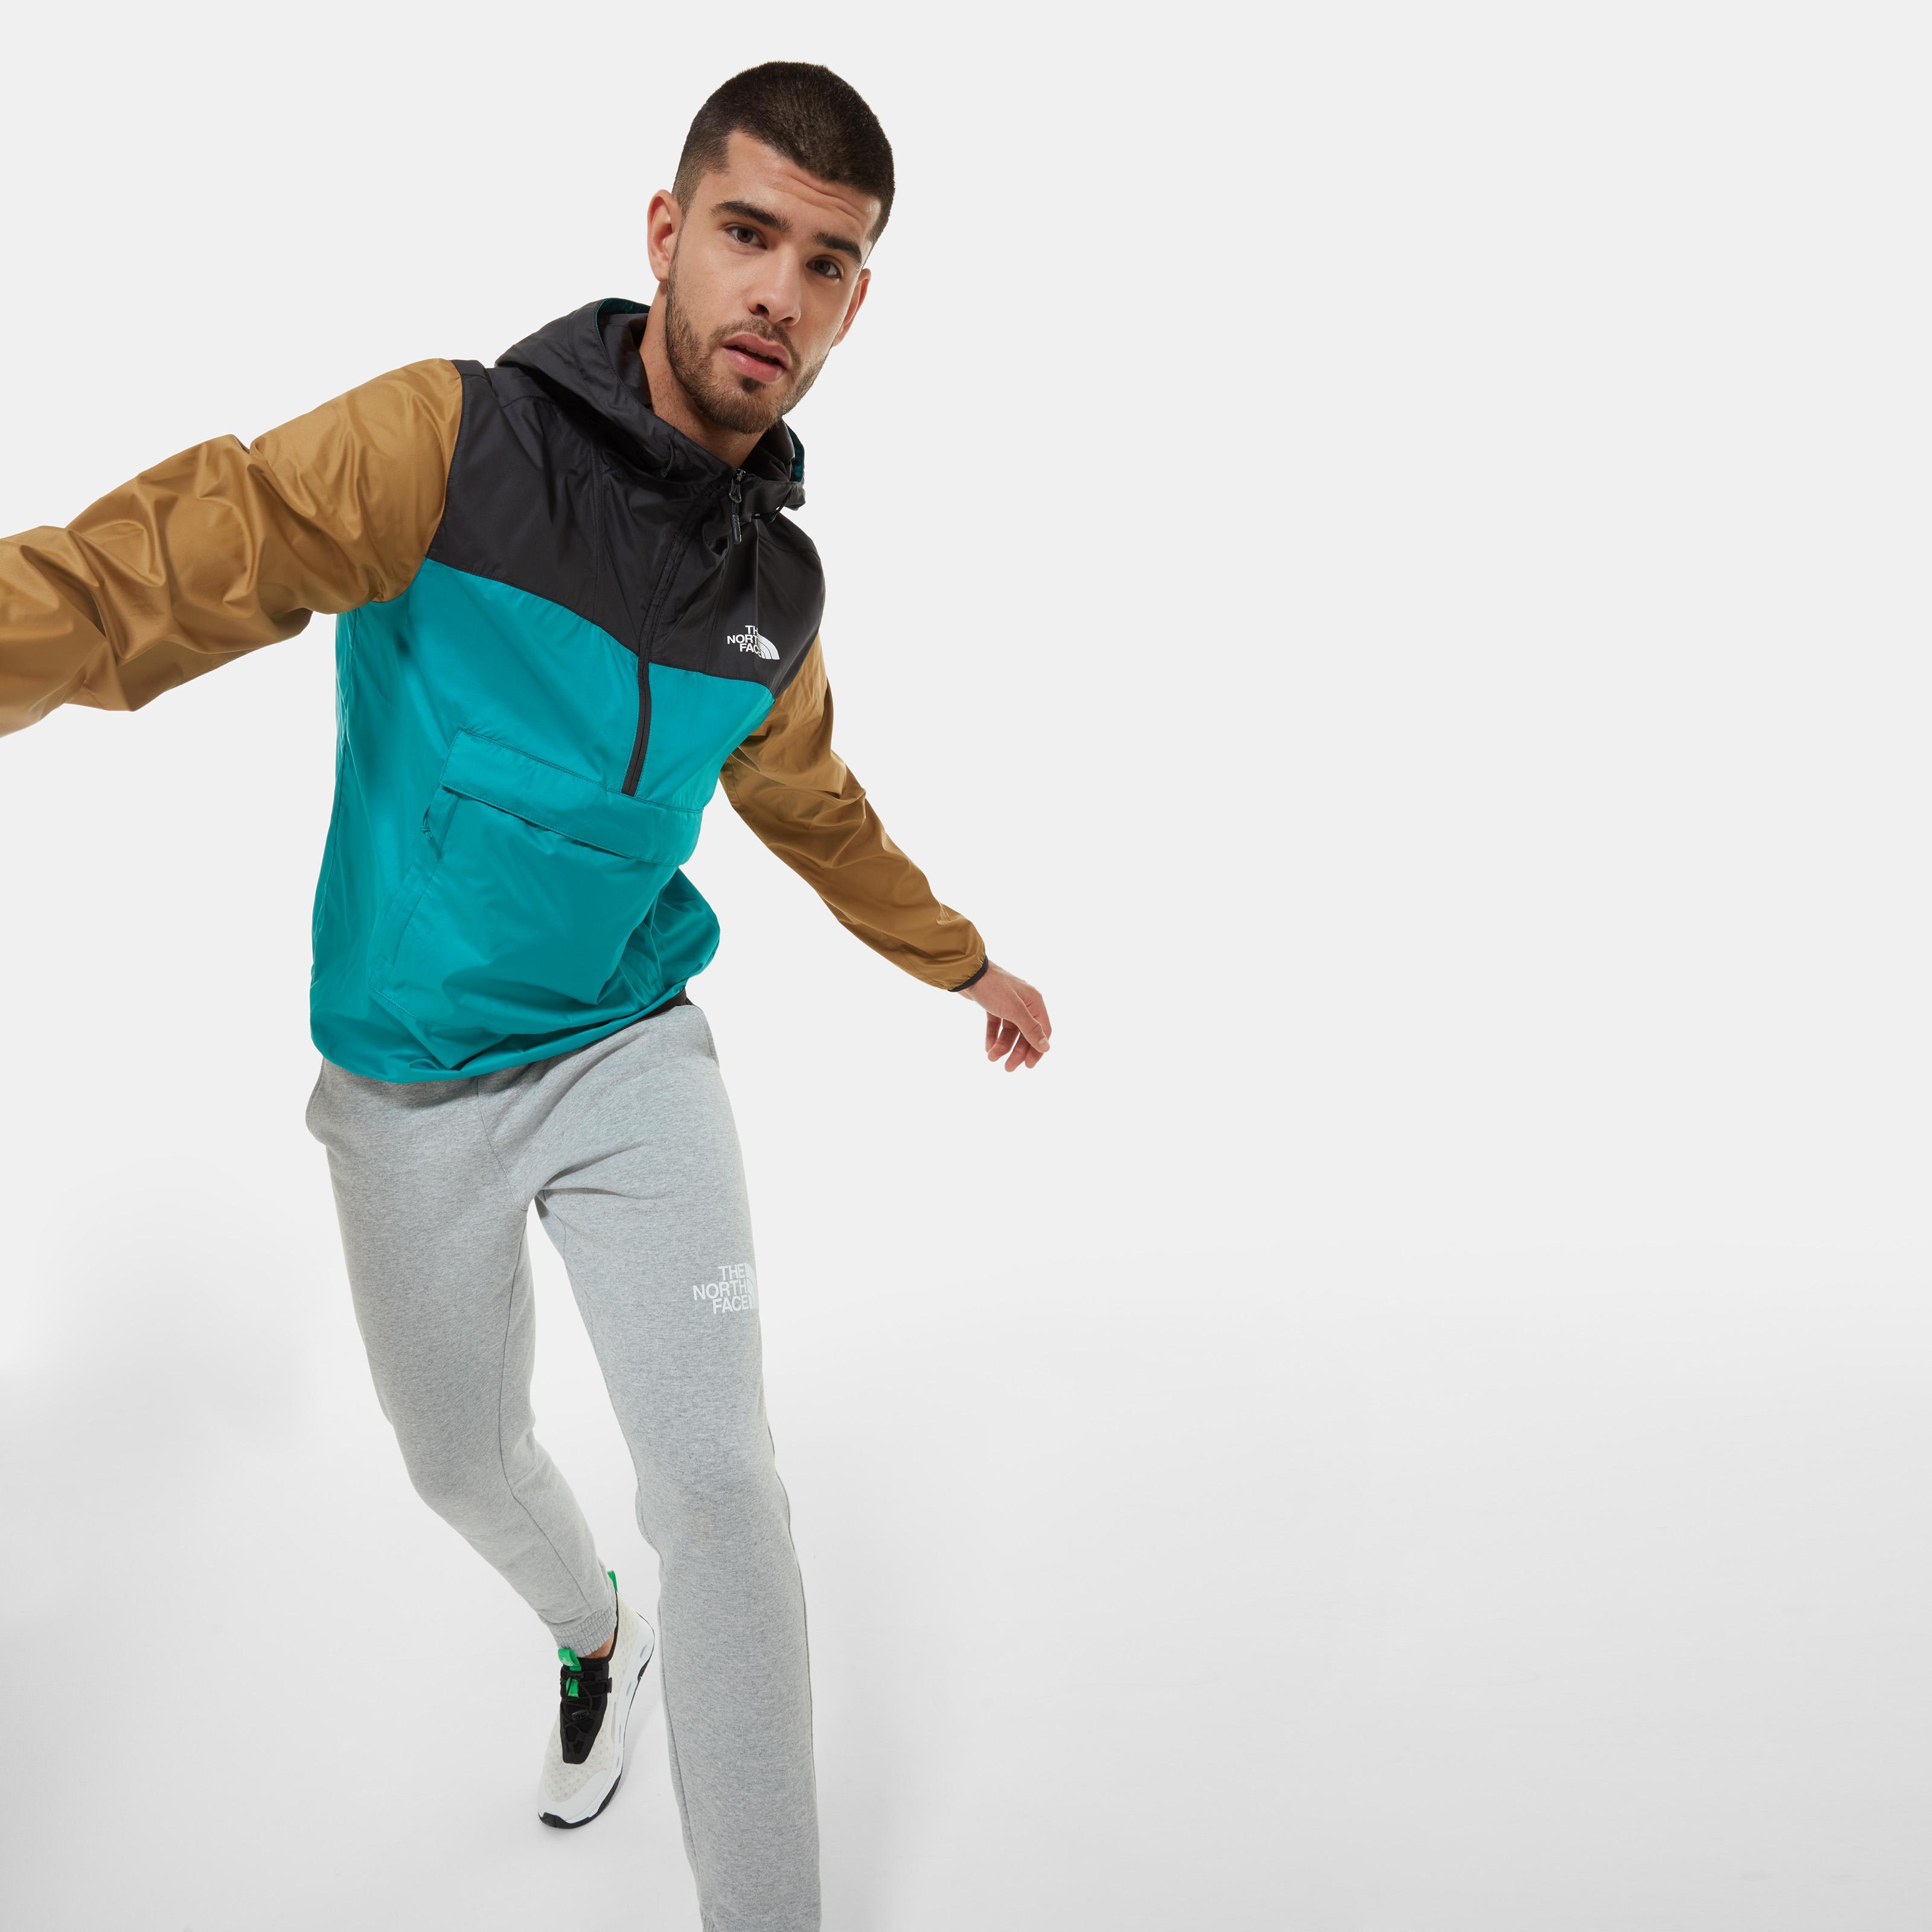 Мужская куртка Fanorak Packable Jacket фото